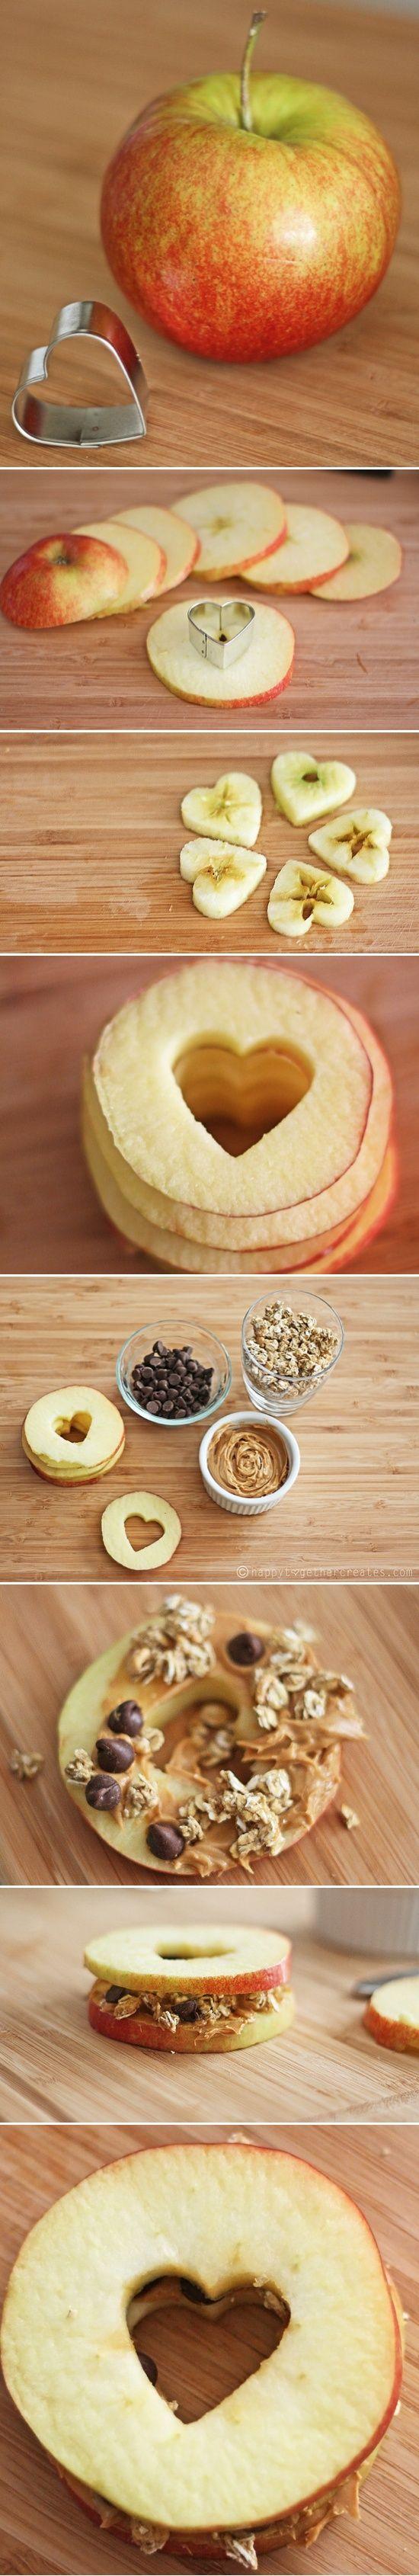 Heart-y Apple Sandwiches!